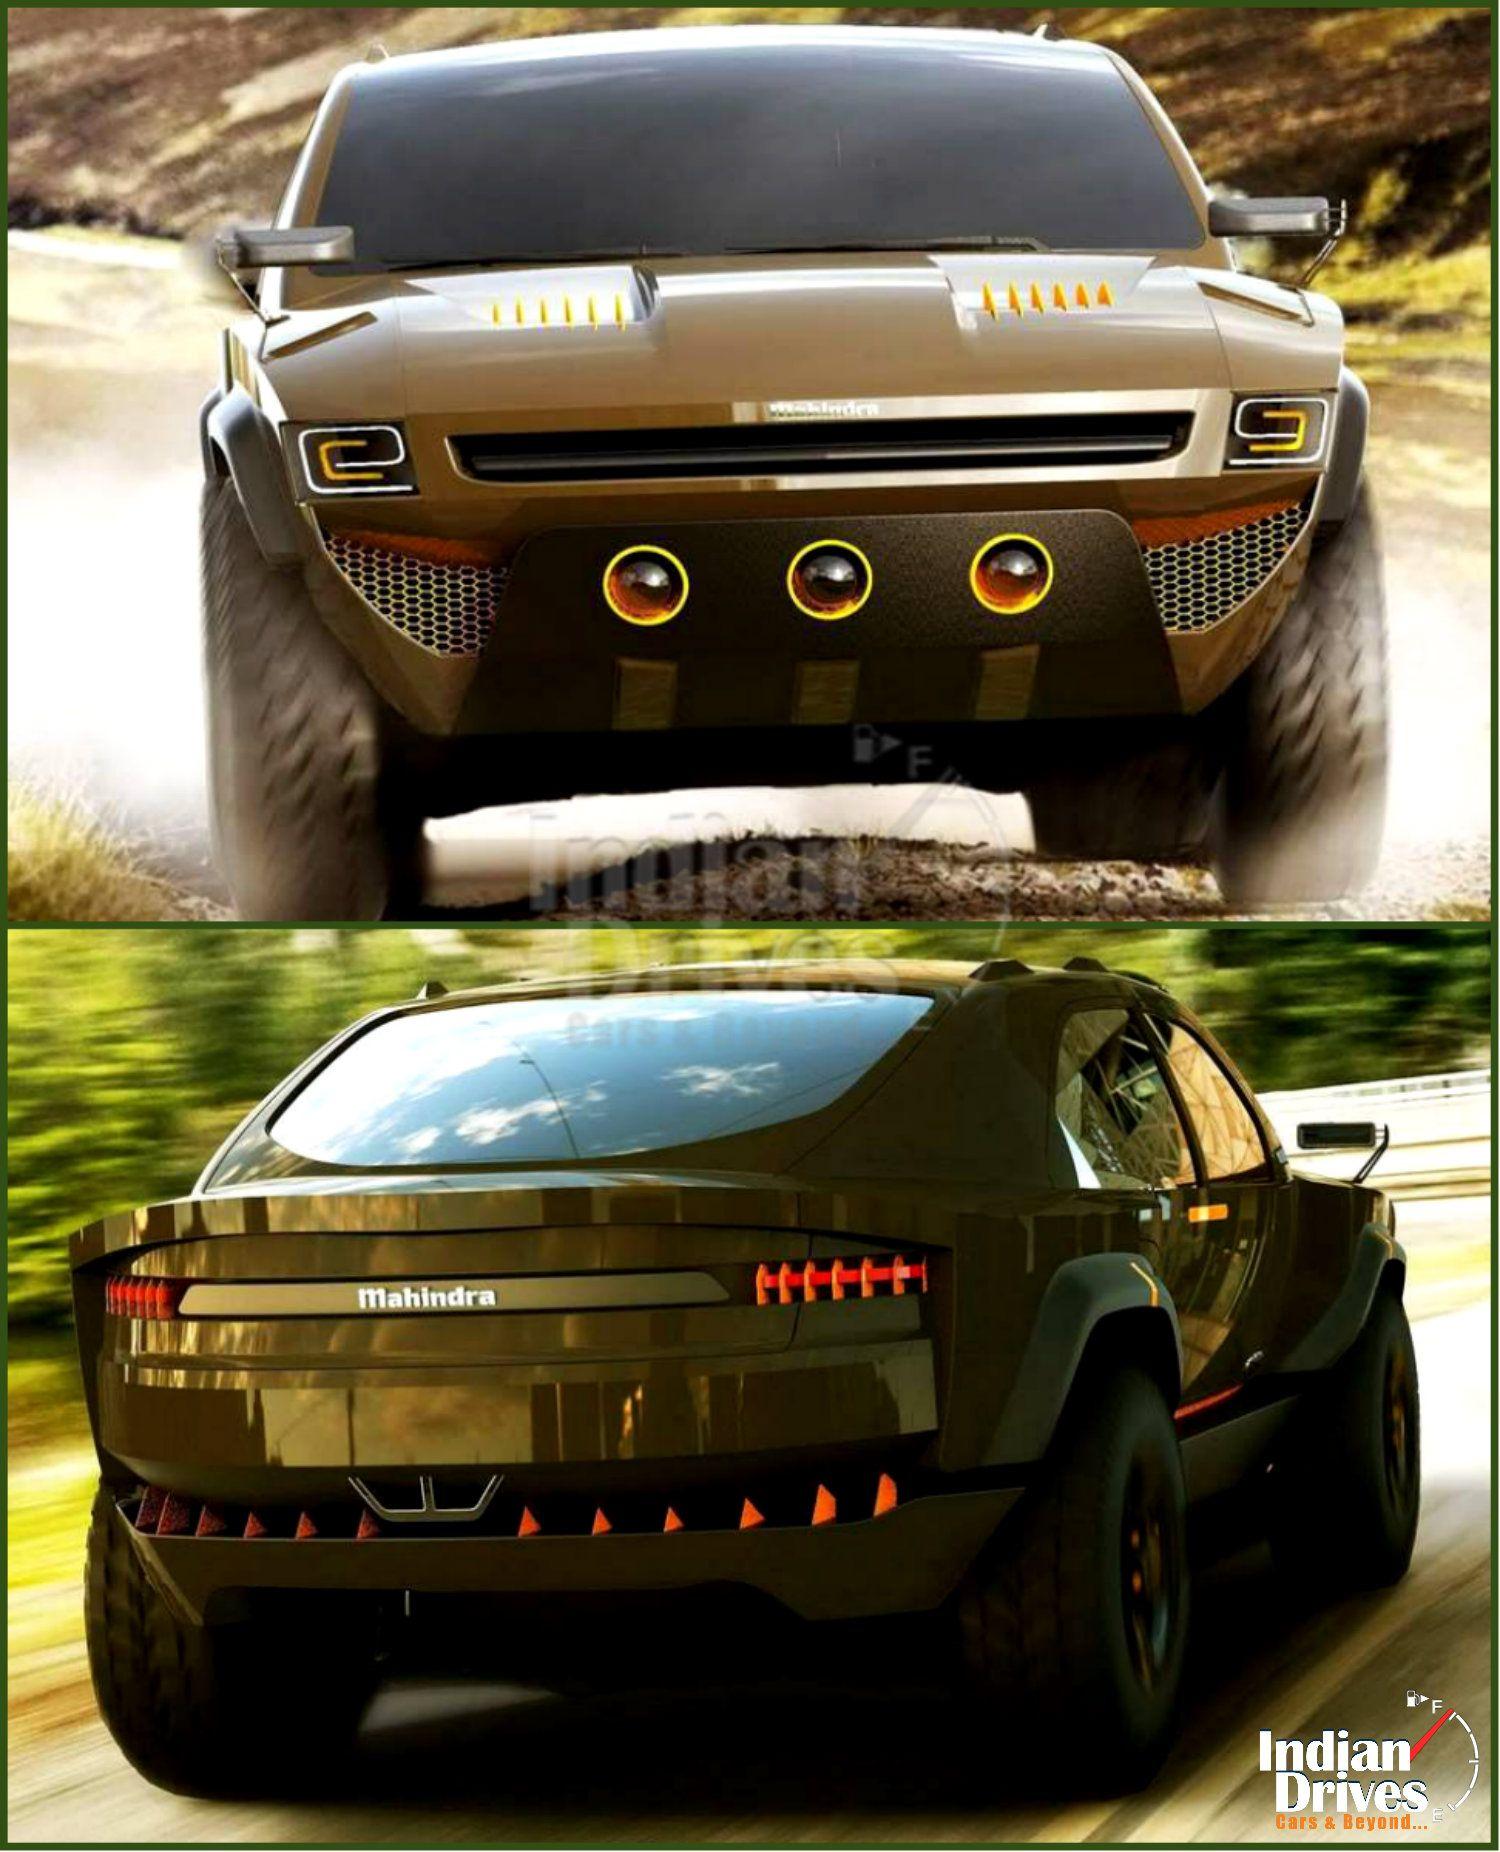 2014 Mahindra SUV IED Komodo Concept by Indian designer